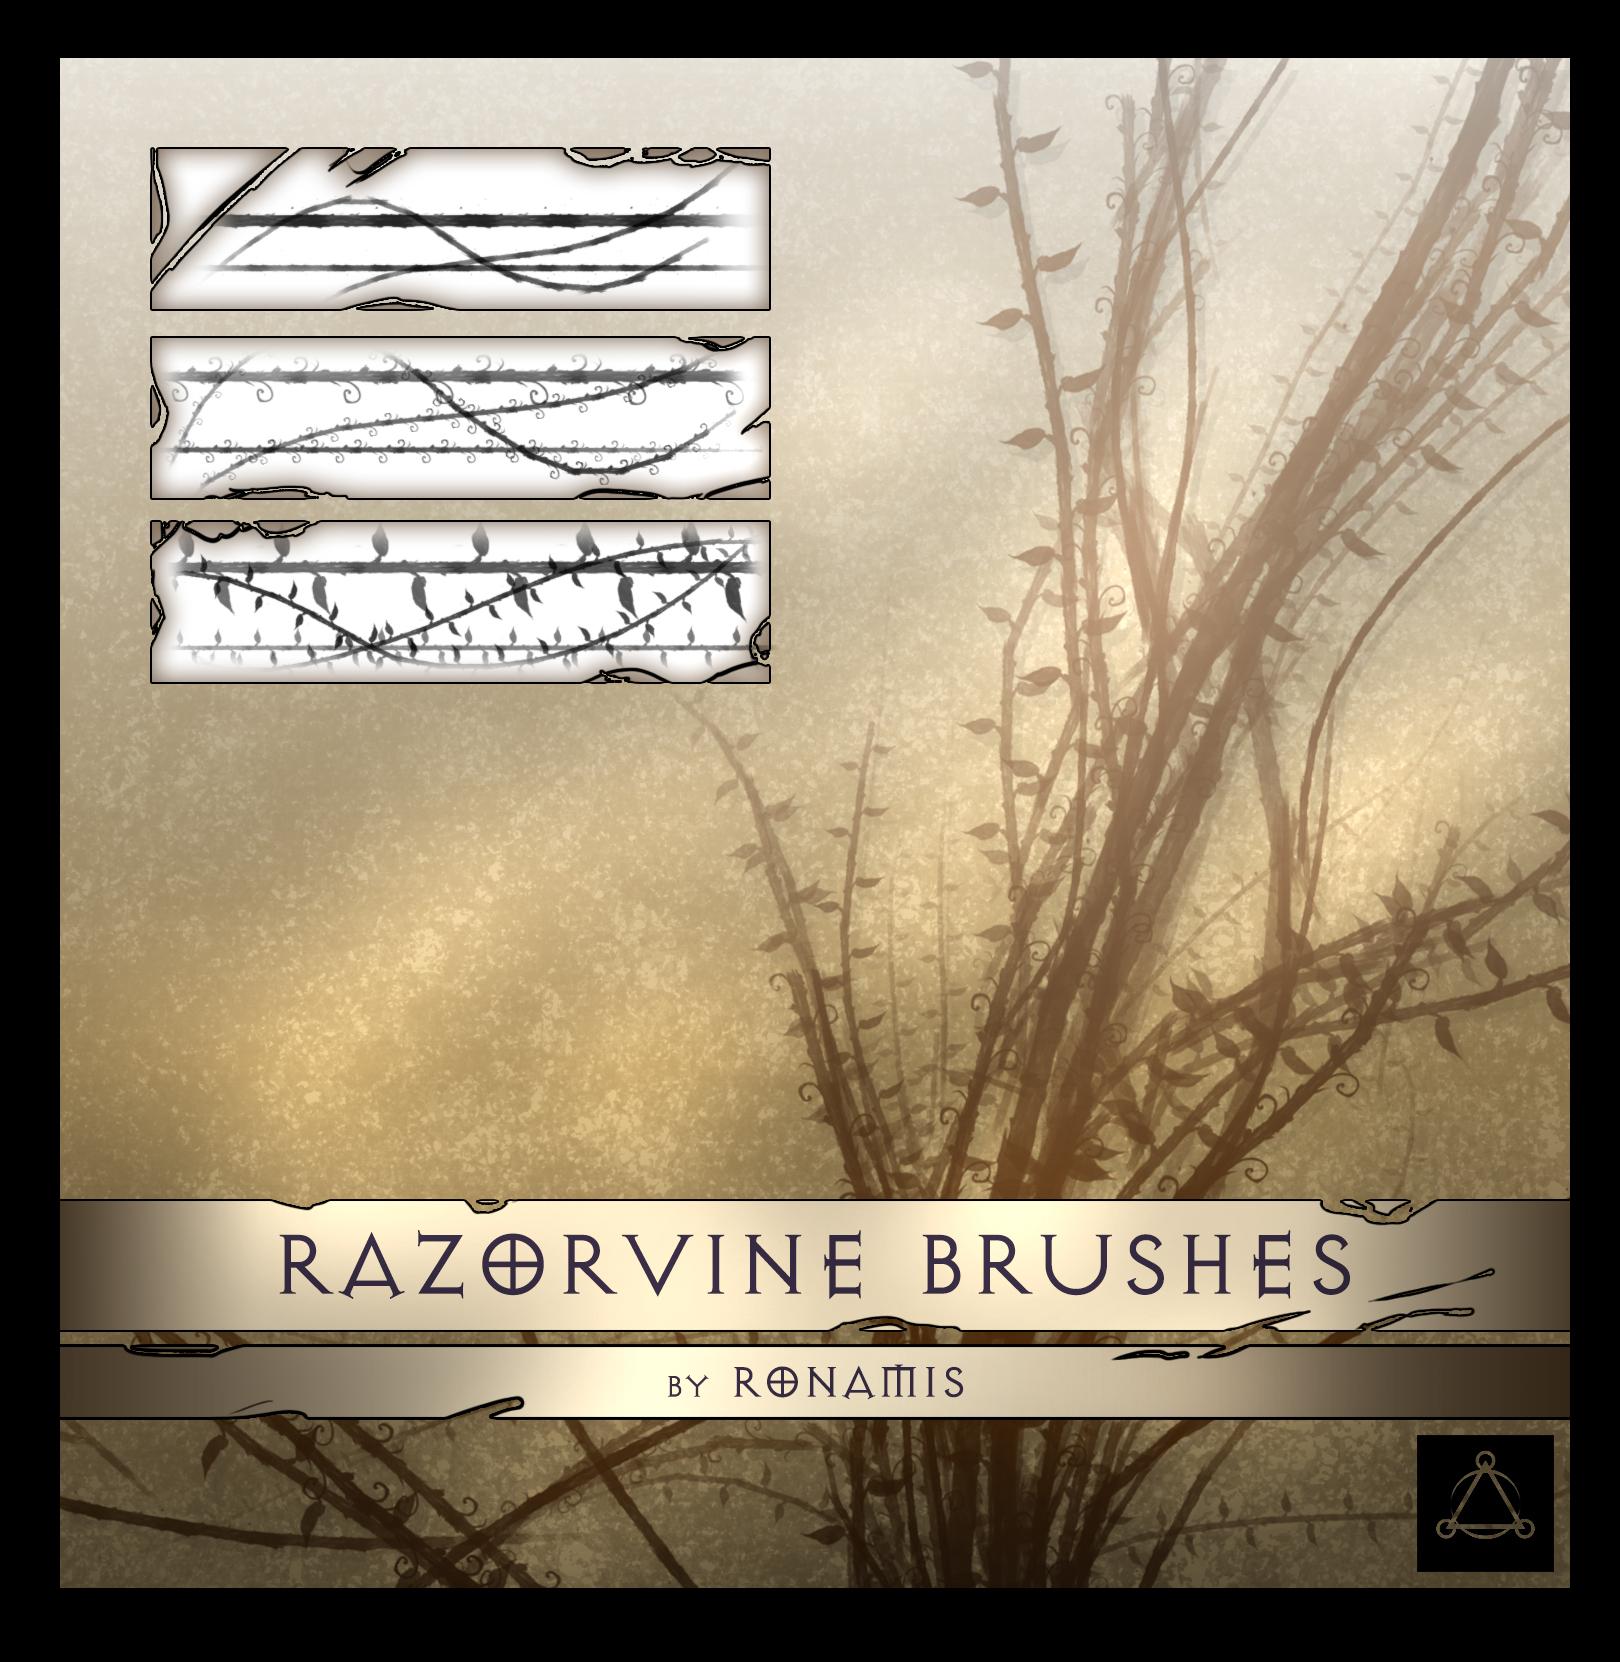 "ronamis ""Razorvine Brushes"" - by ronamis (Michael Malkin) ronamis.deviantart.com (2015) © dell'autore tutti i diritti riservati"